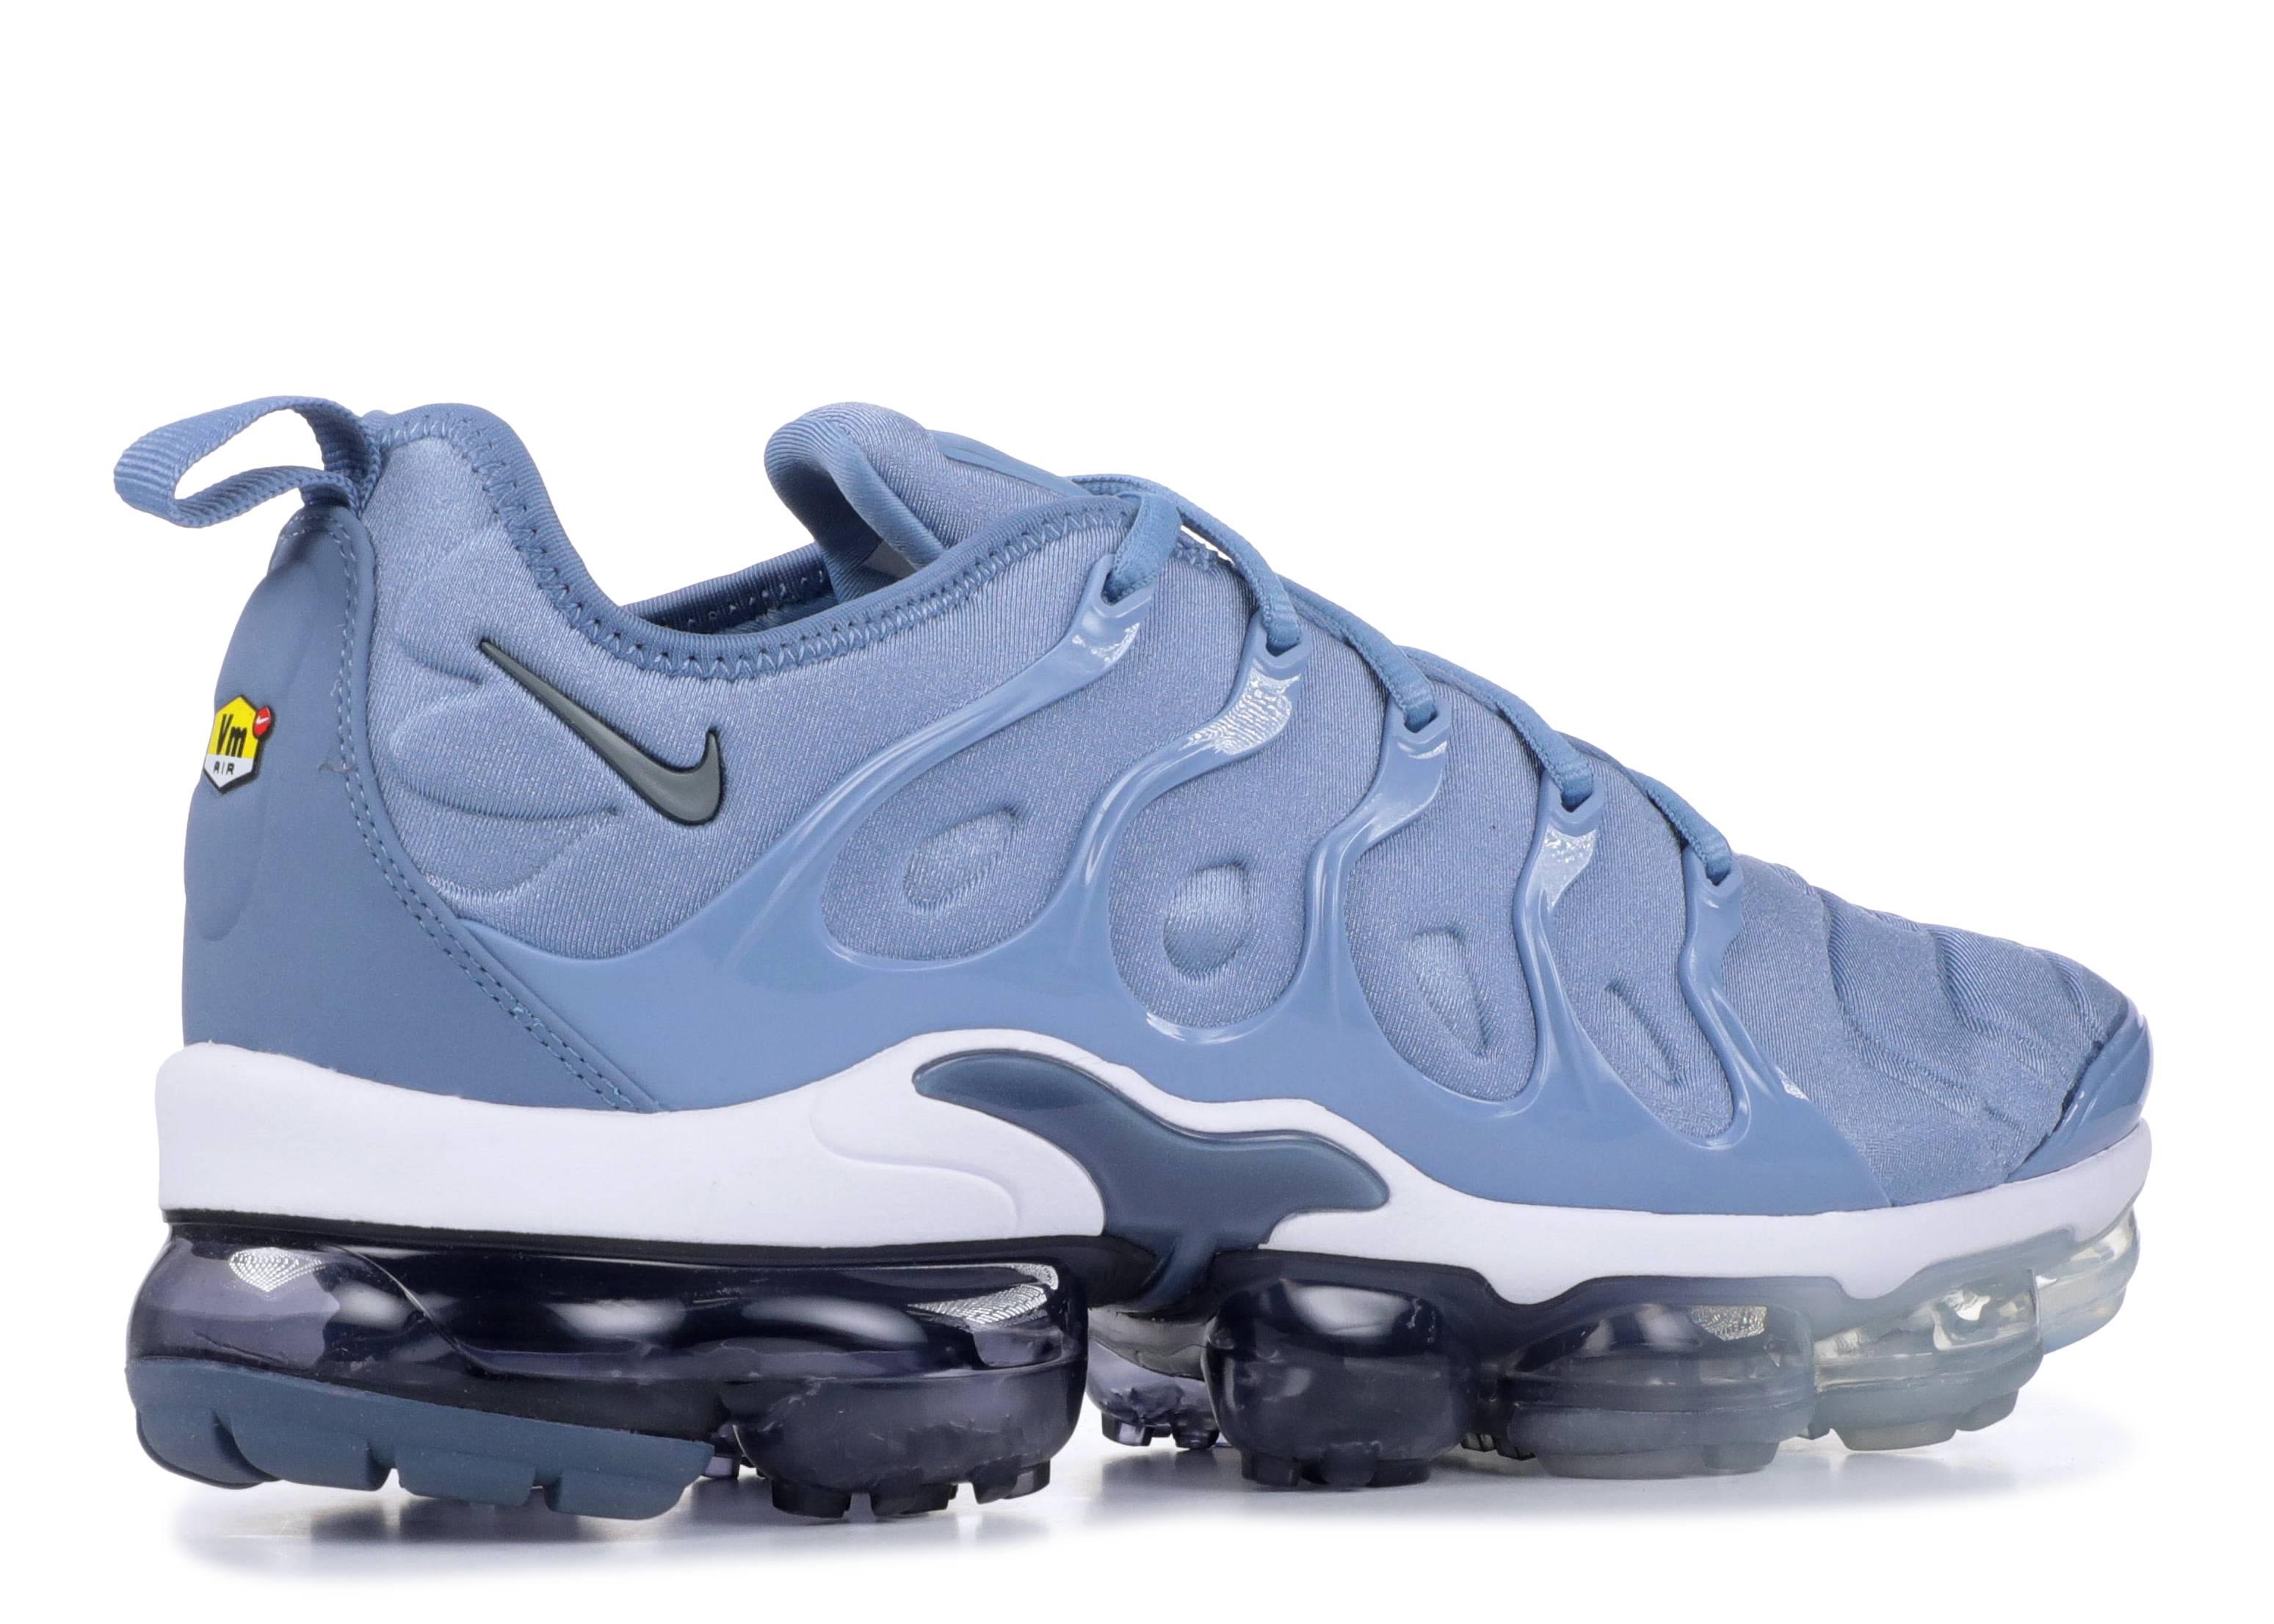 23015b3f8cd Air Vapormax Plus - Nike - 924453 402 - work blue cool grey